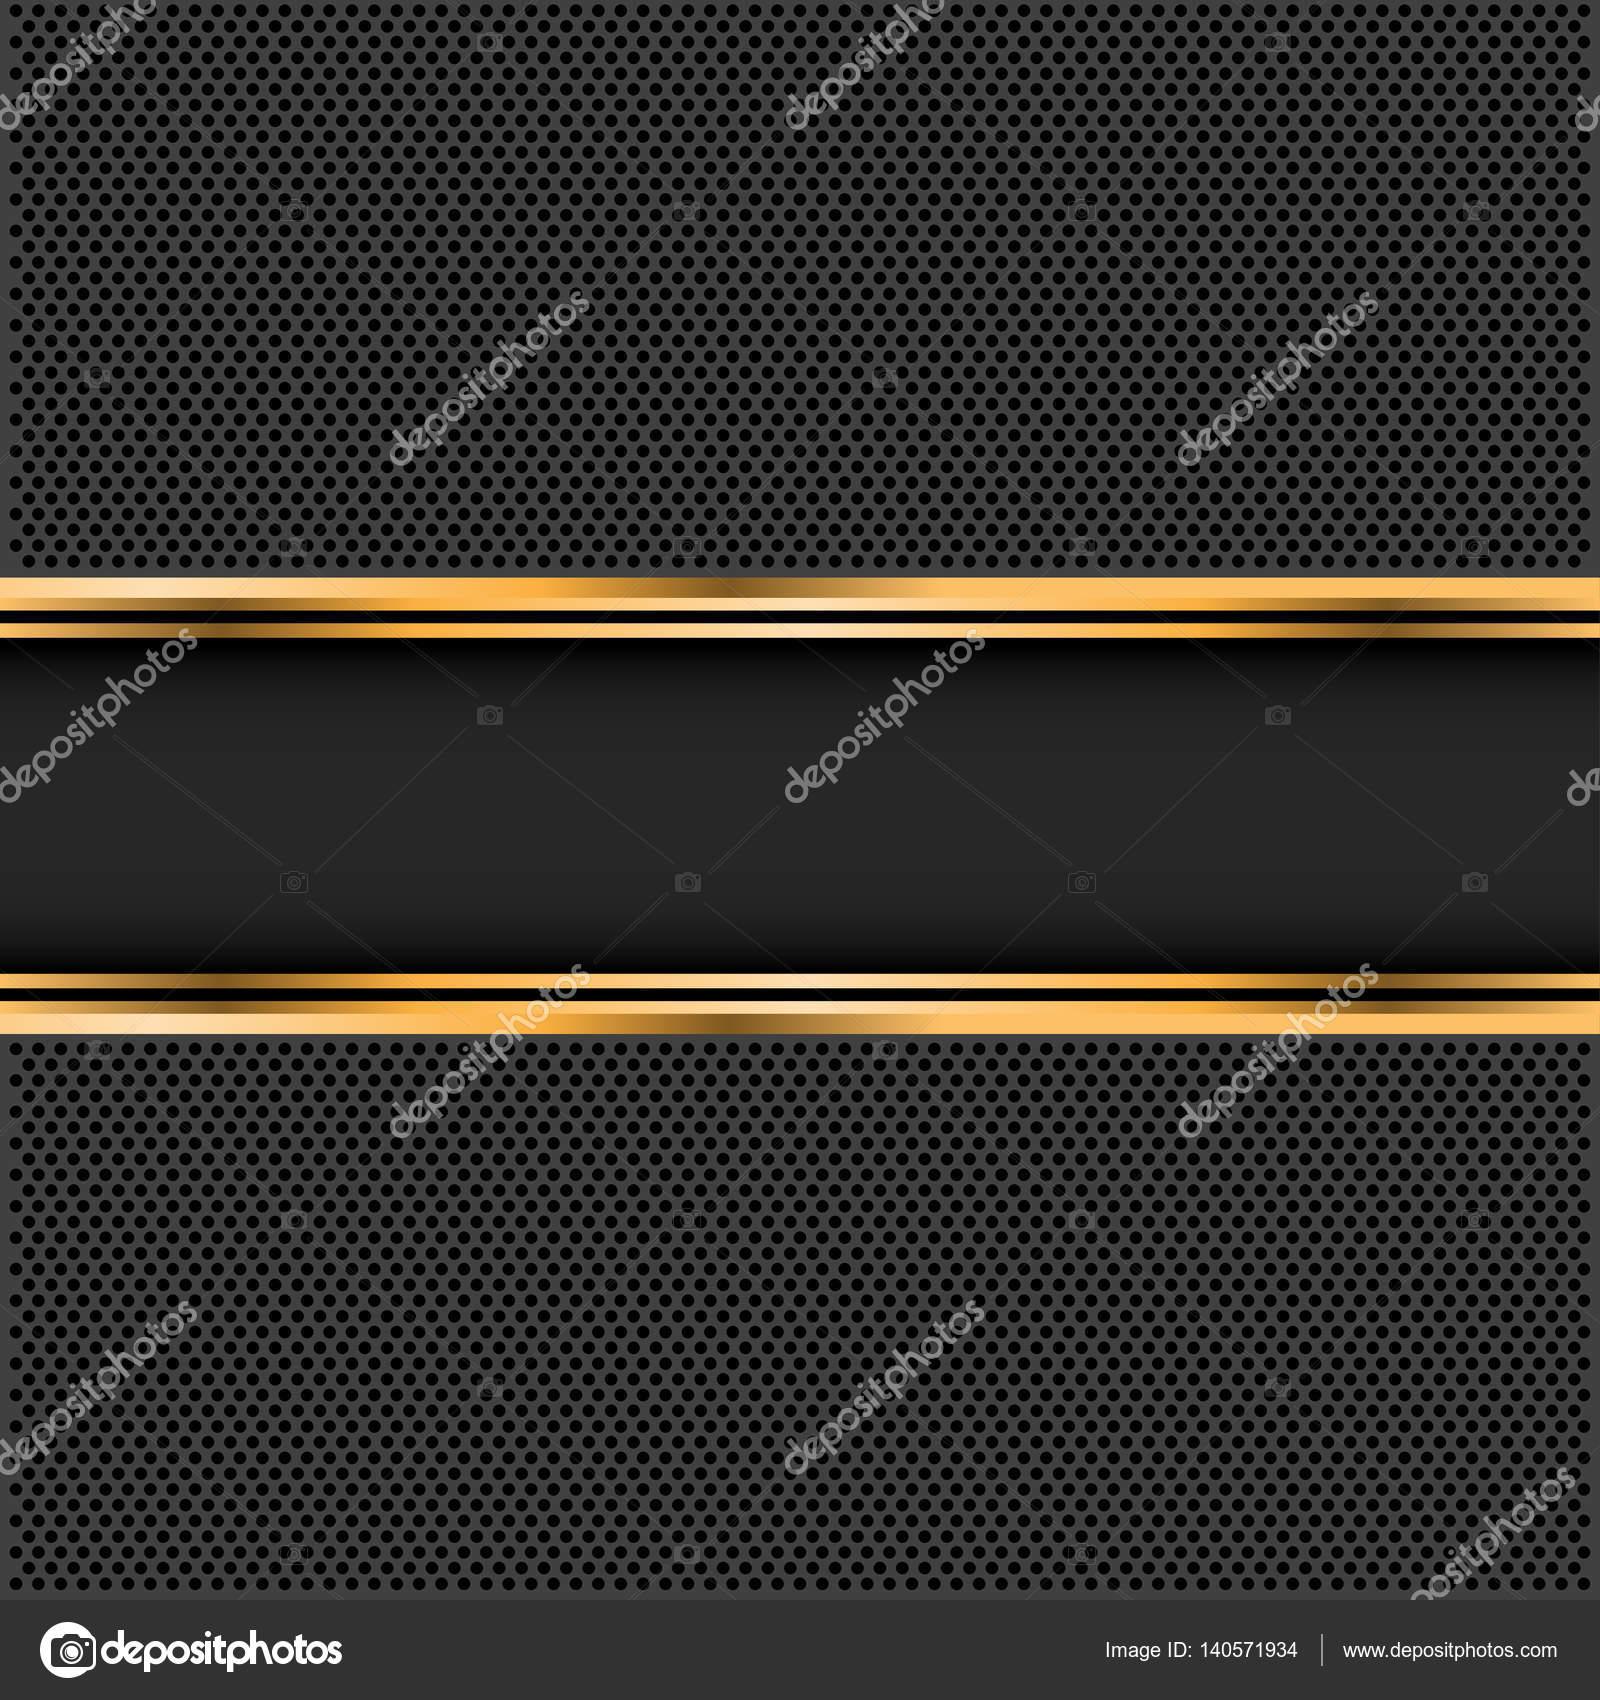 Abstract Black Gold Banner On Dark Gray Circle Mesh Design